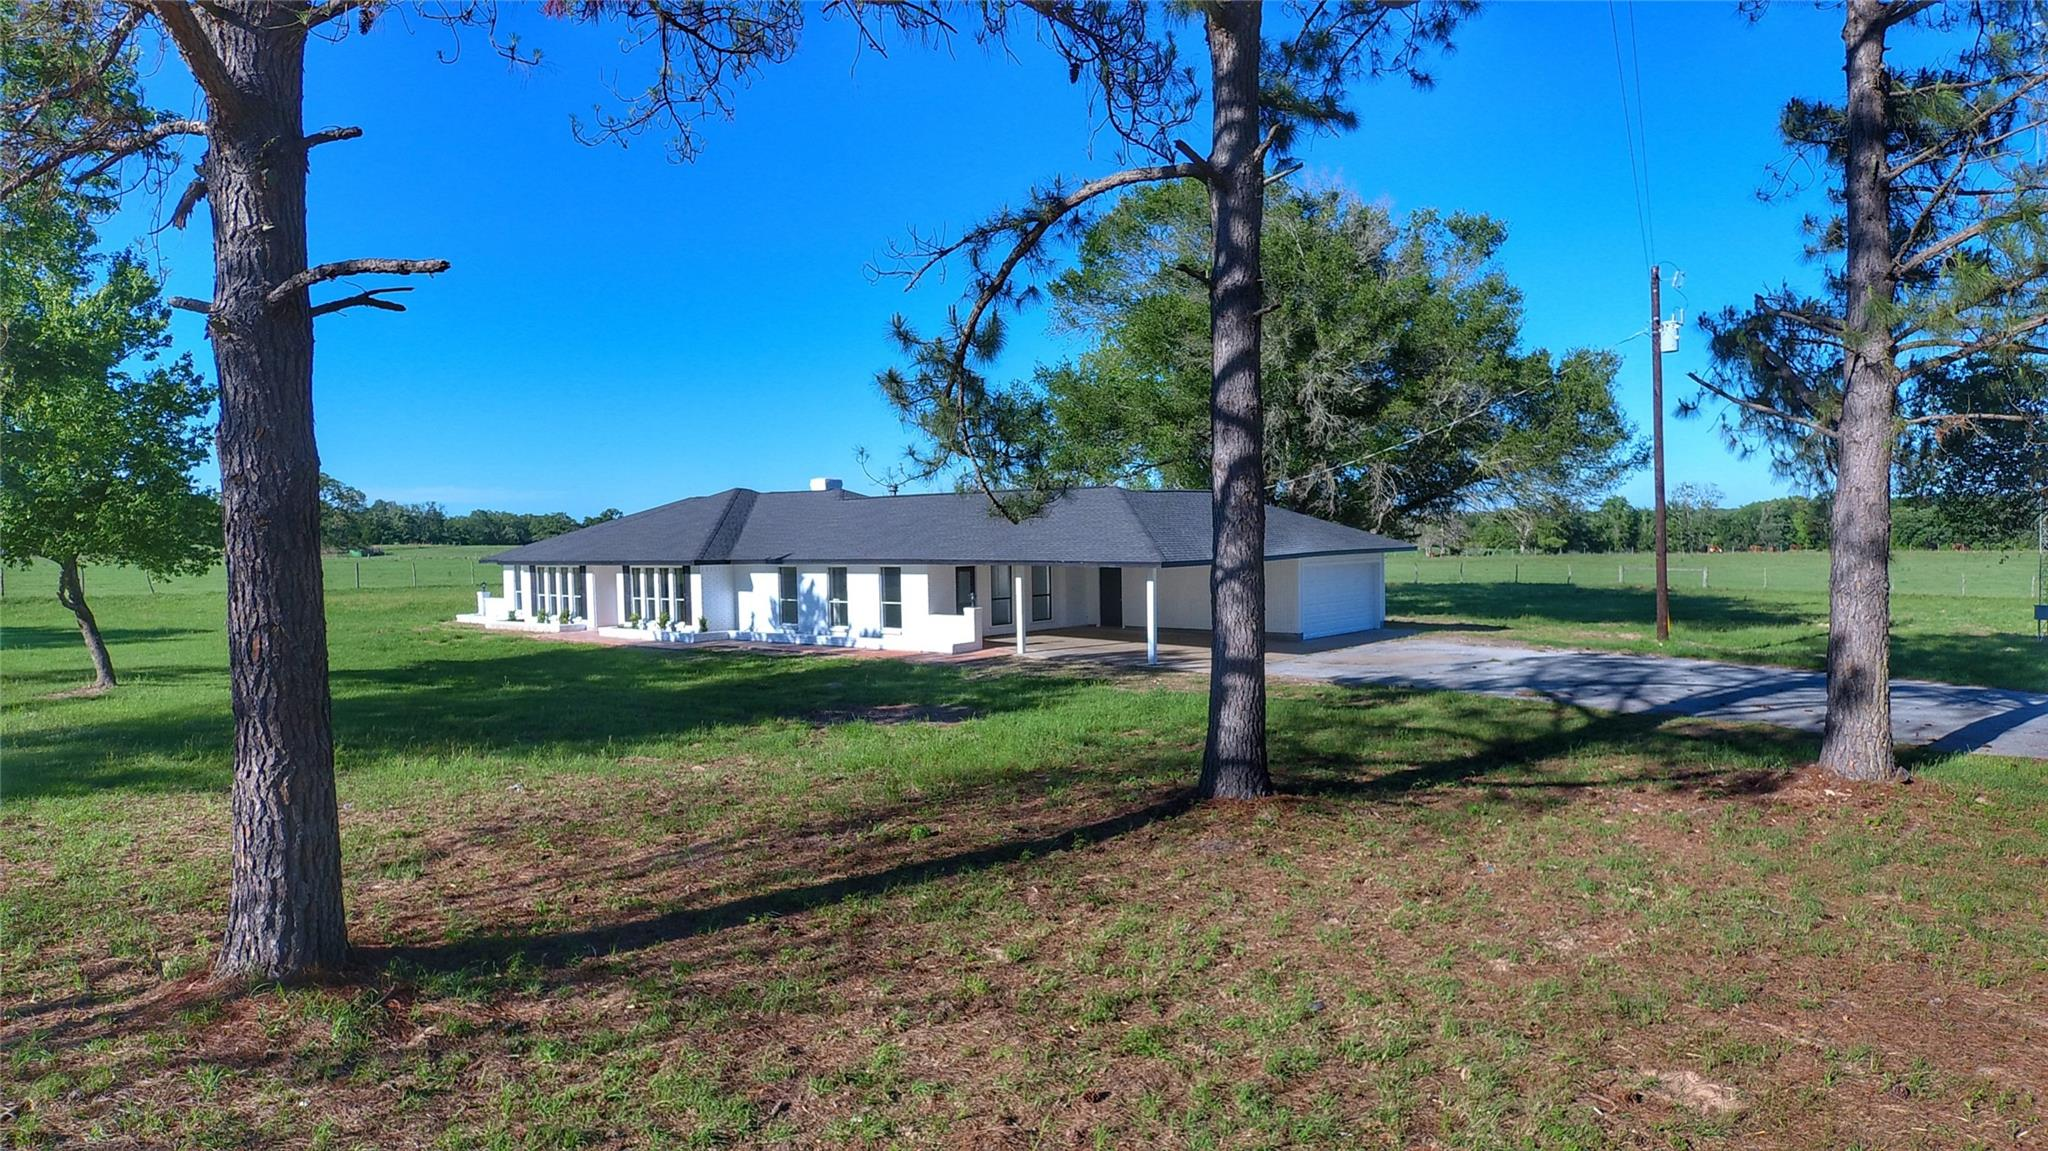 635 Fm 1848 Property Photo - Buffalo, TX real estate listing